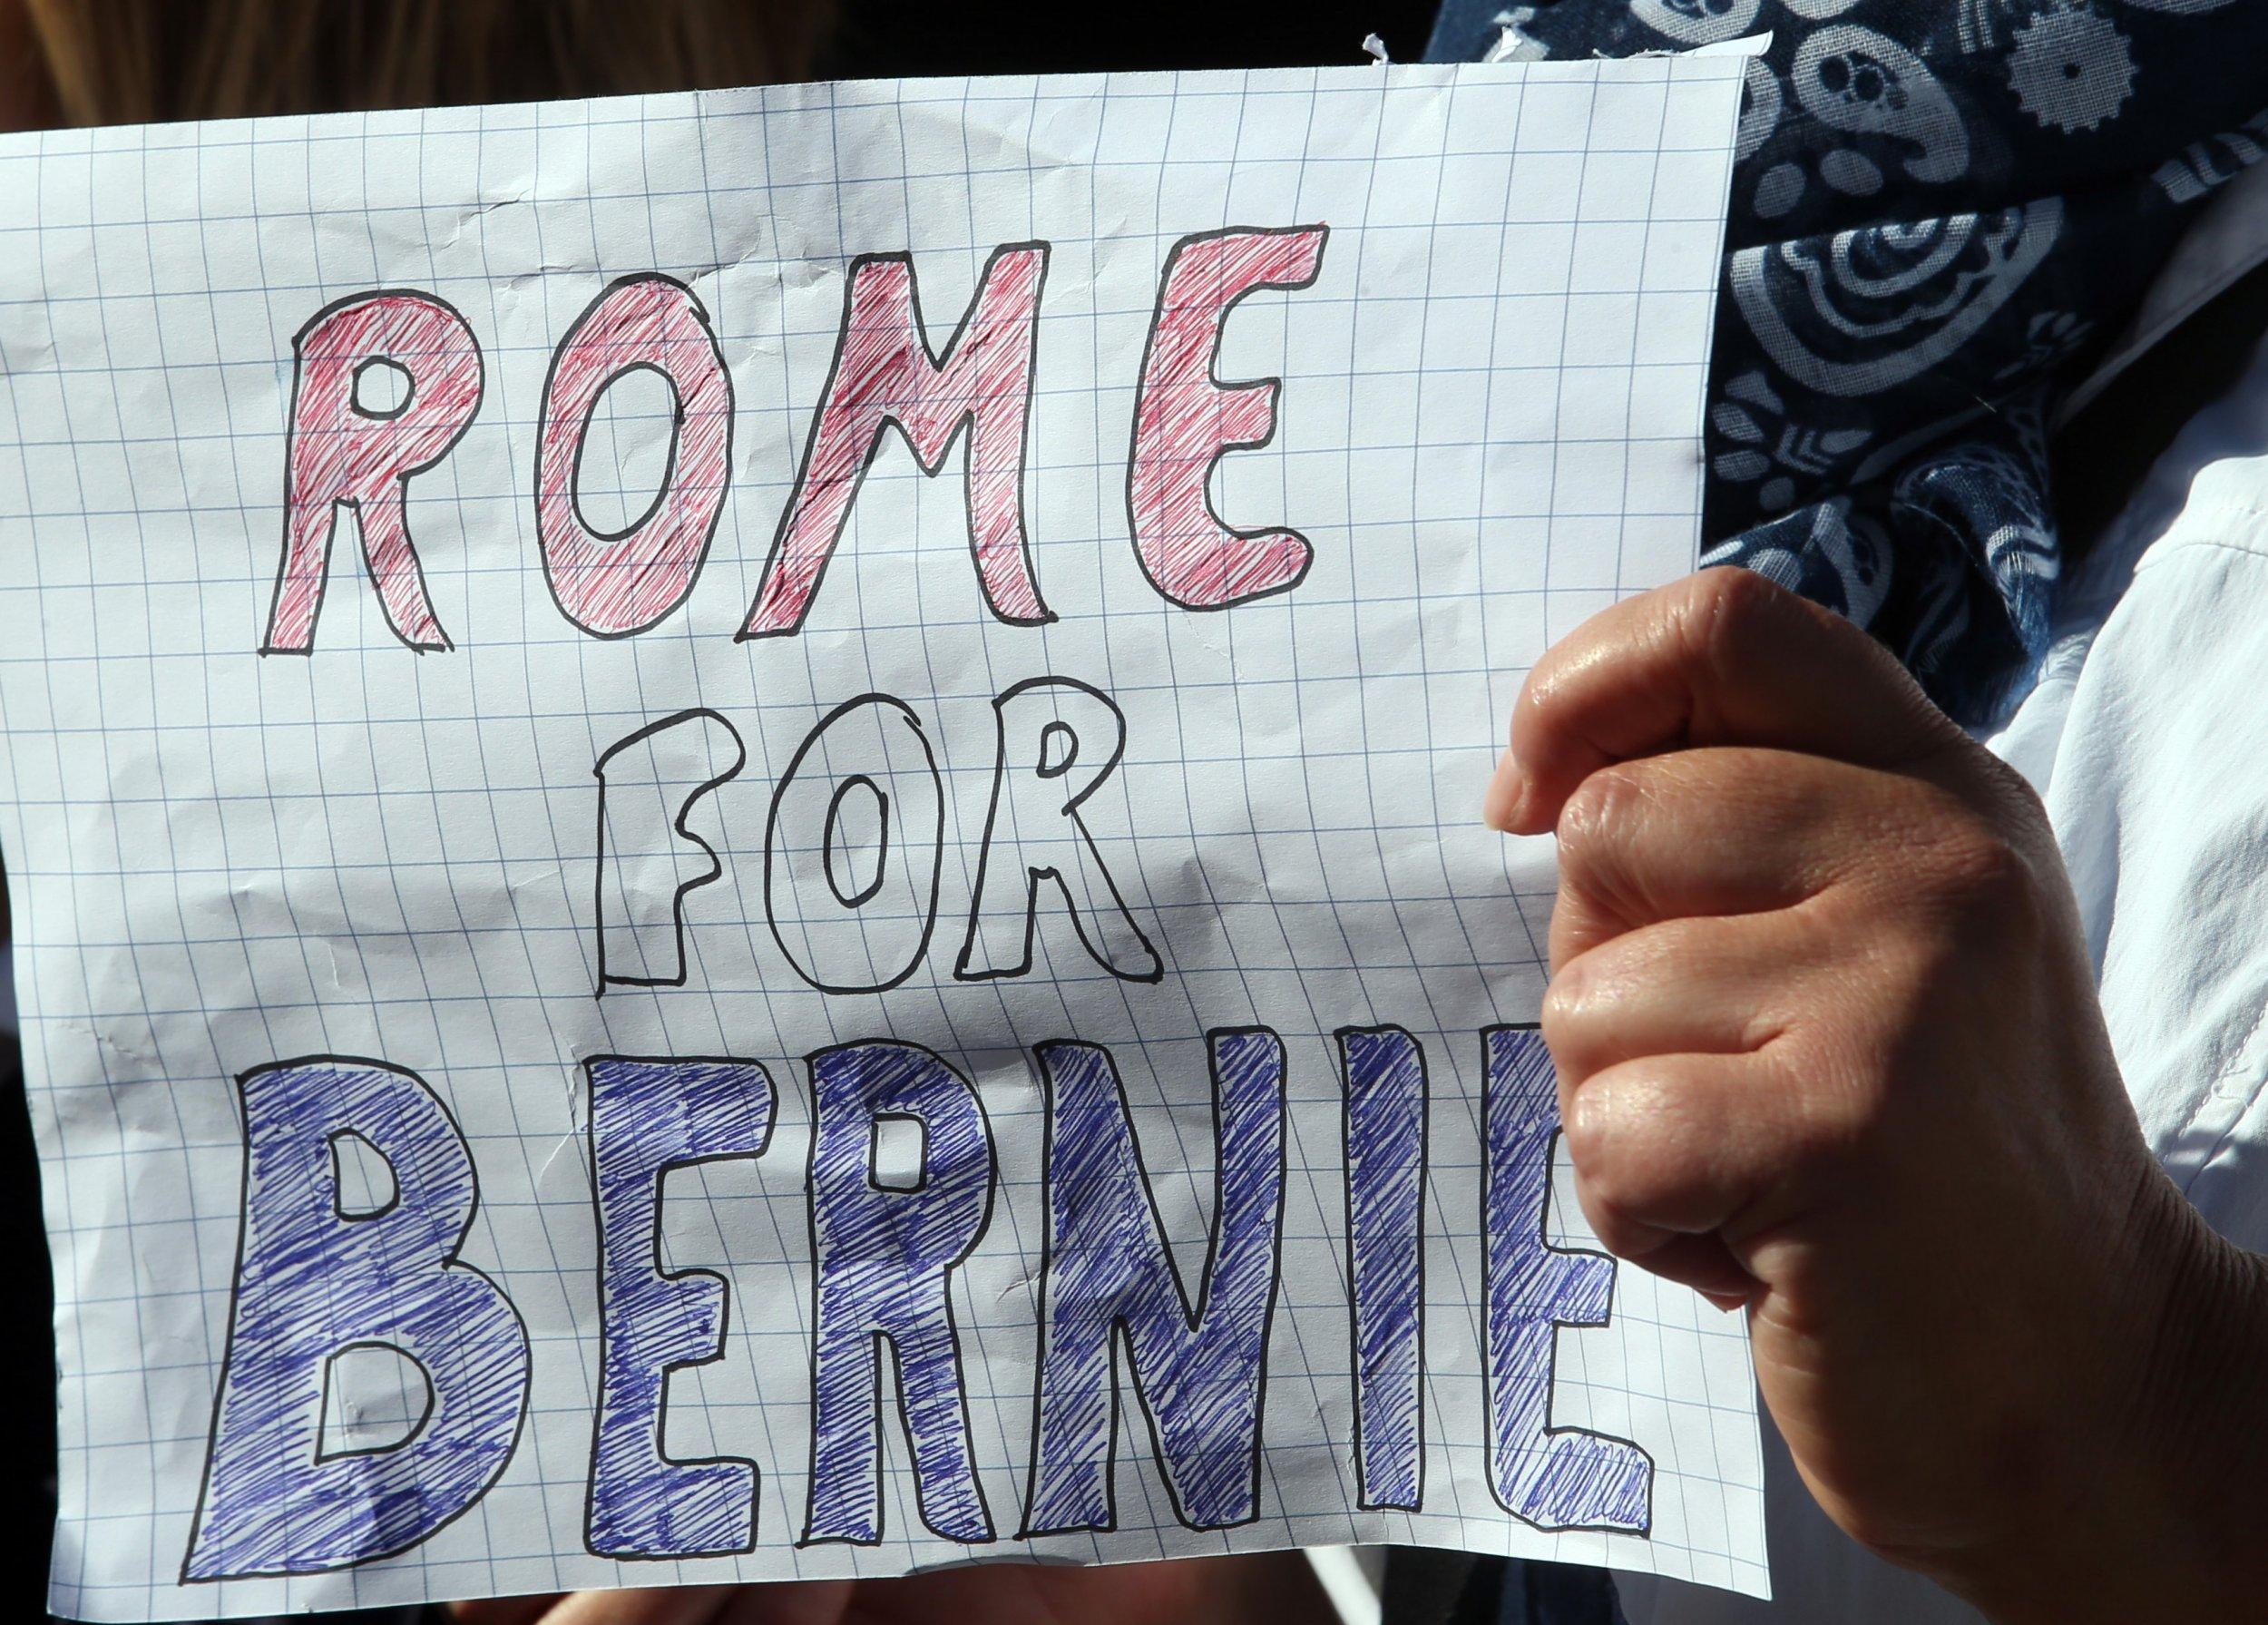 Bernie Rome